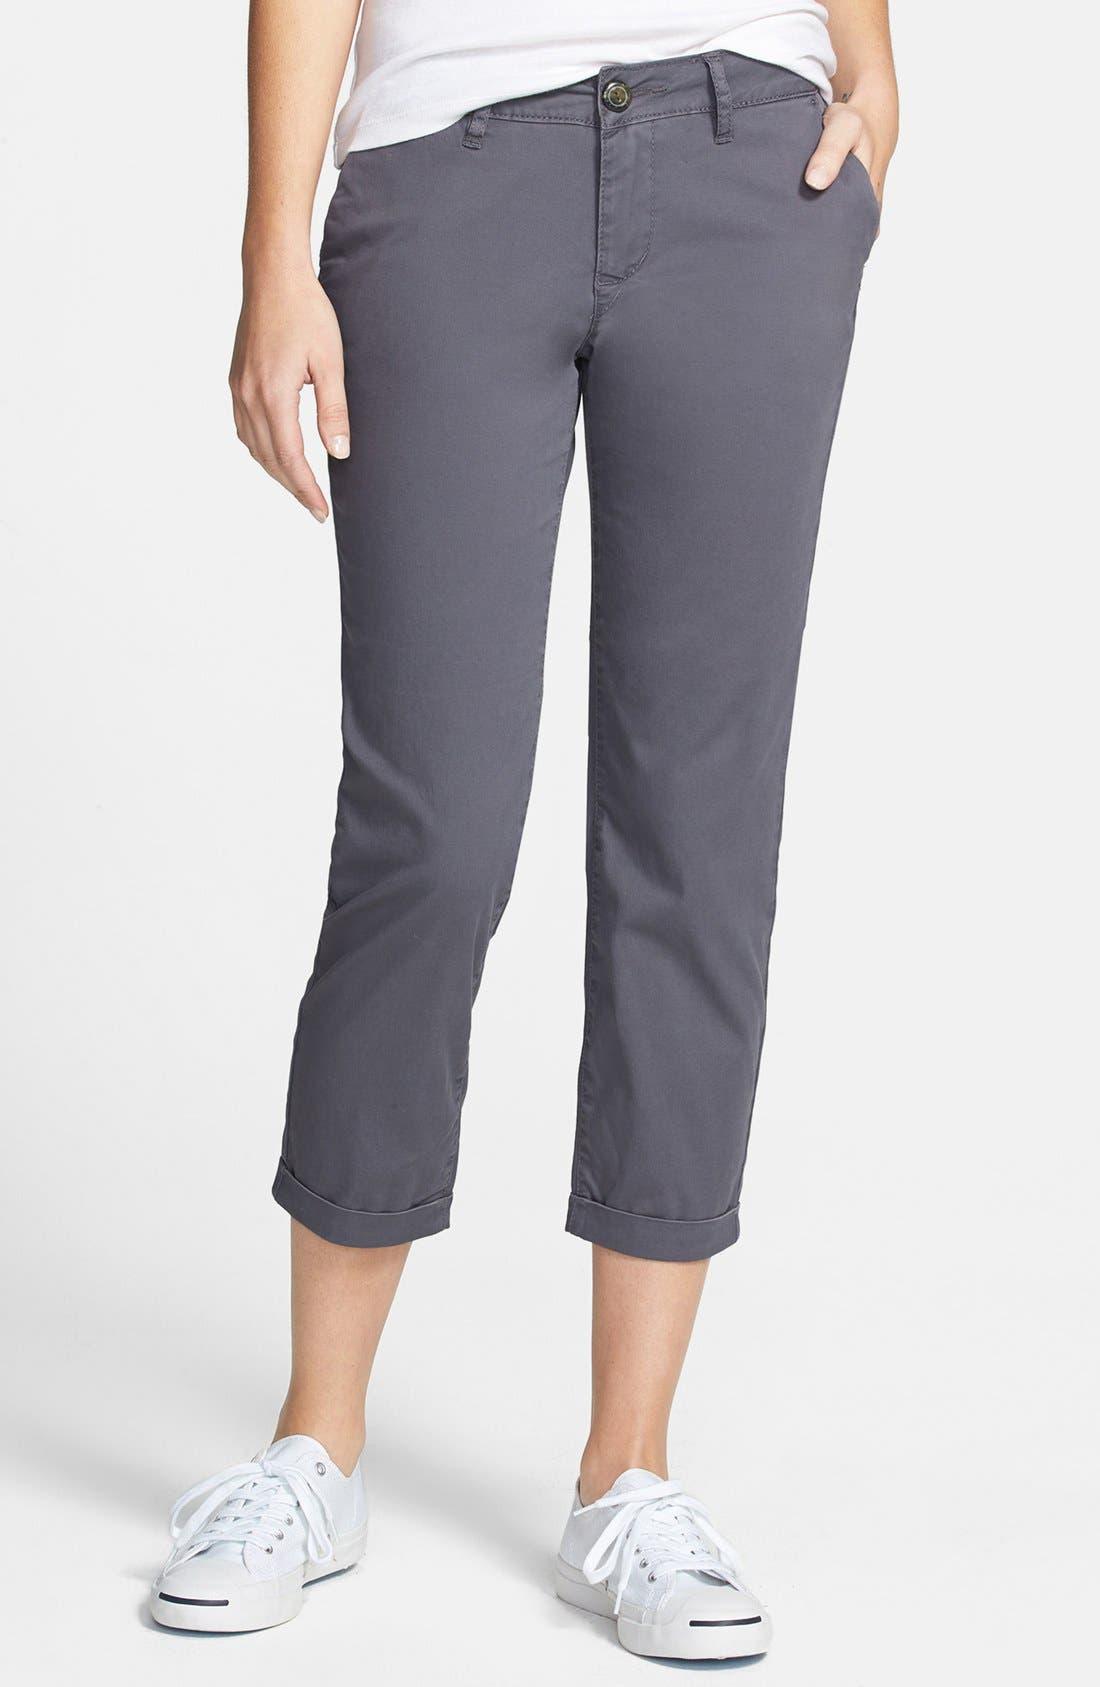 Alternate Image 1 Selected - Jag Jeans 'Cora' Slim Crop Stretch Twill Pants (Regular & Petite)